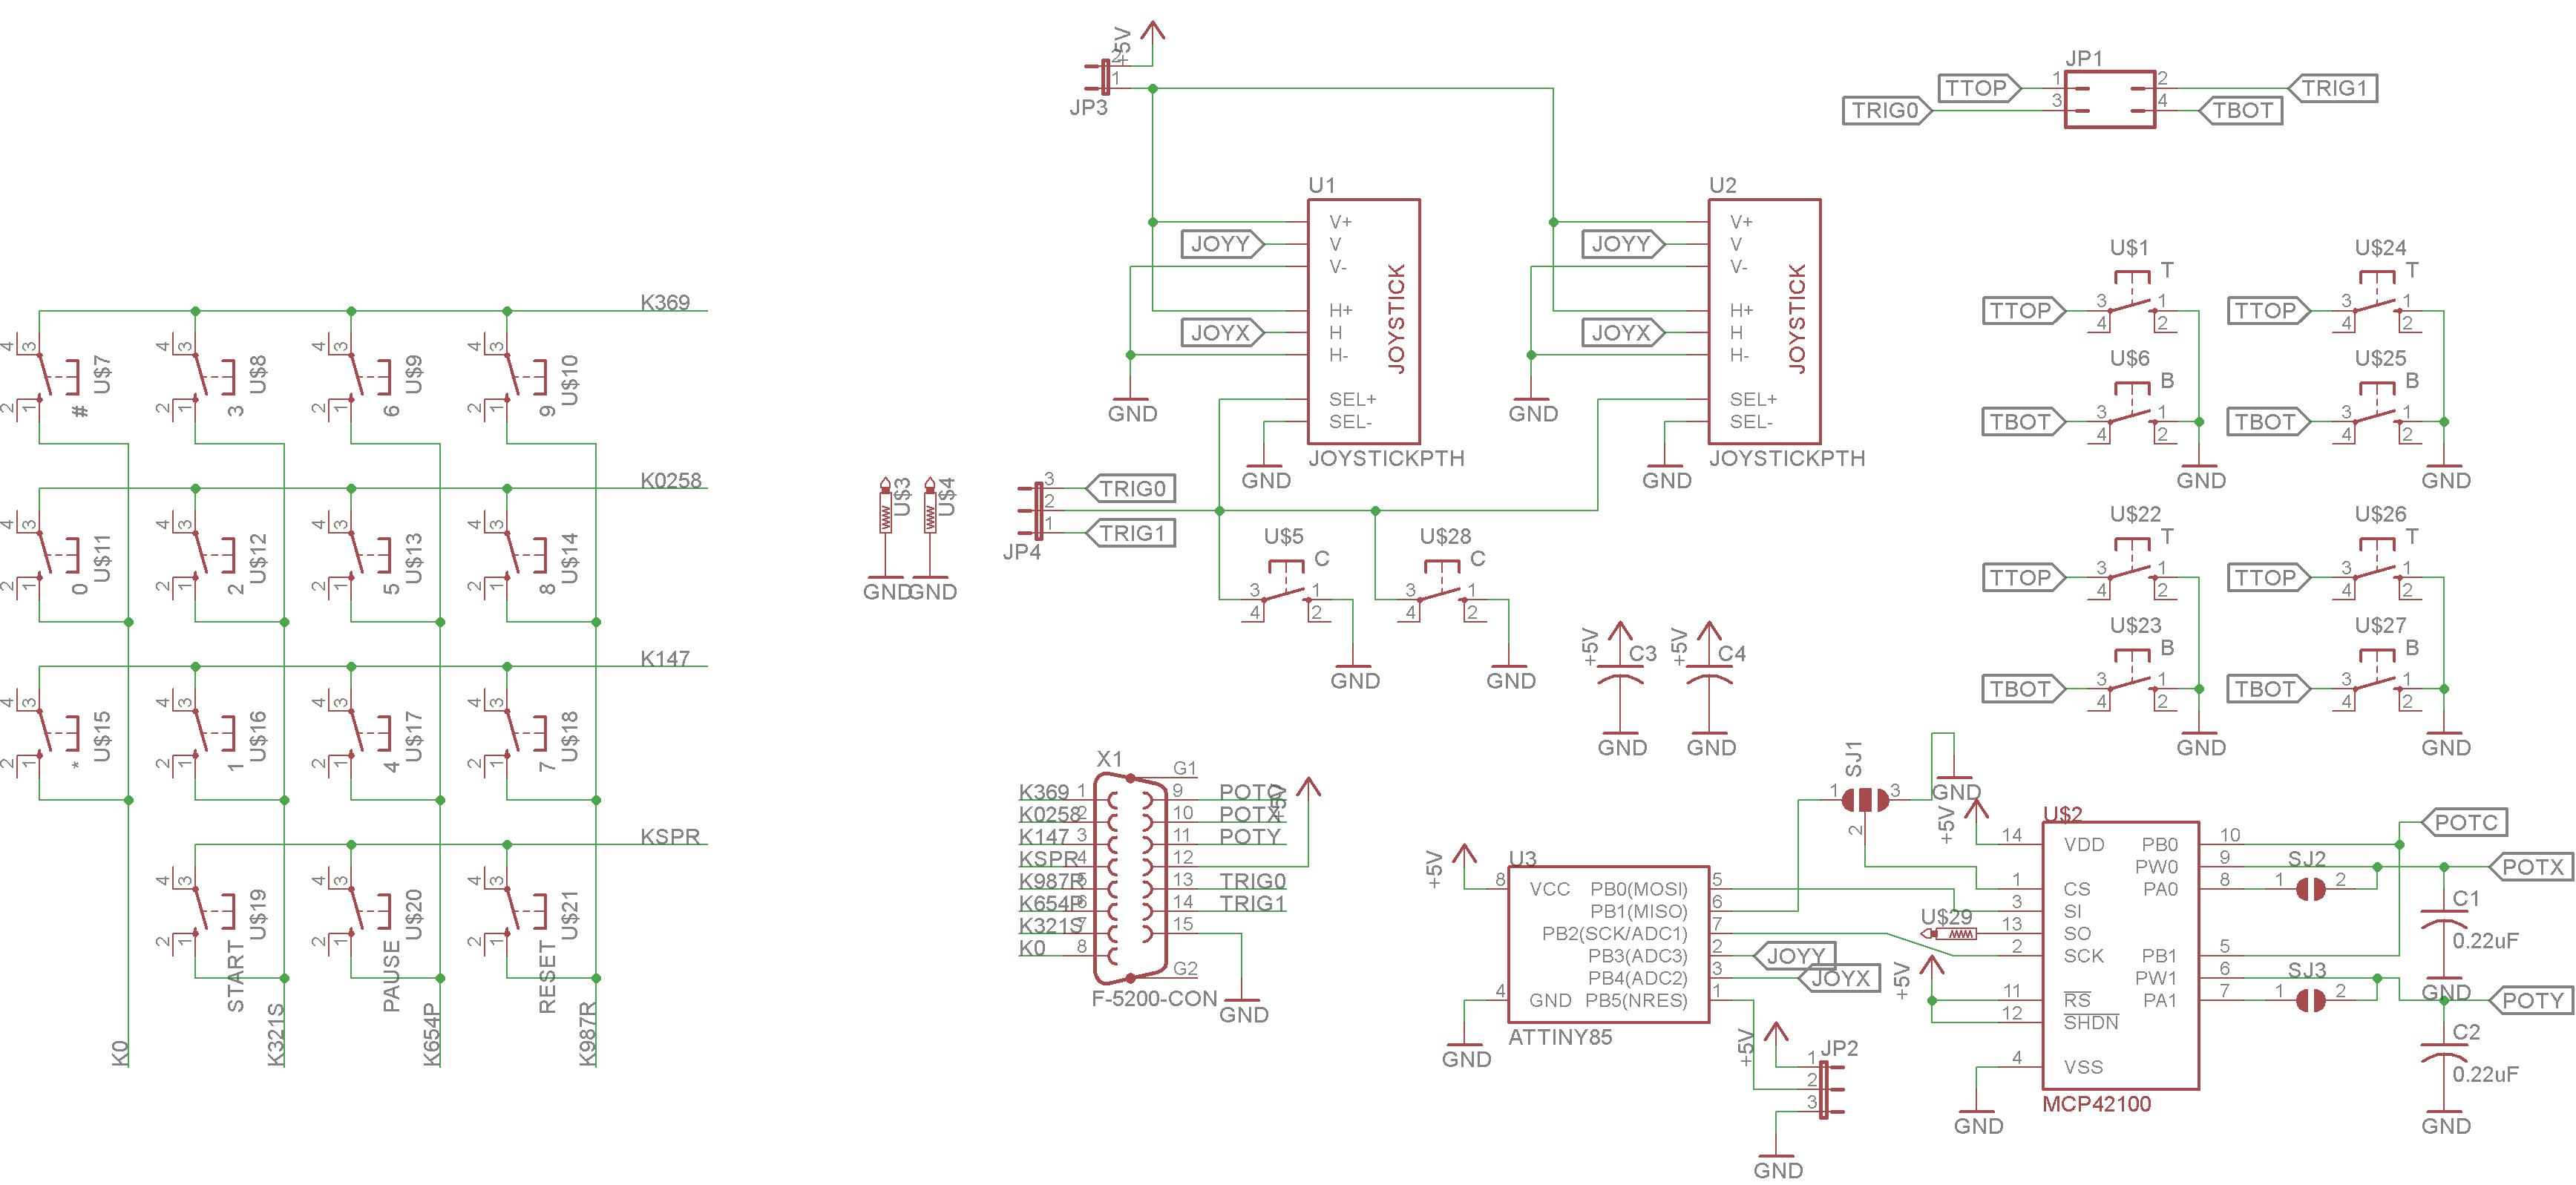 Atari 5200 Controller Wiring Diagram Modern Design Of Analog Joystick Images Gallery